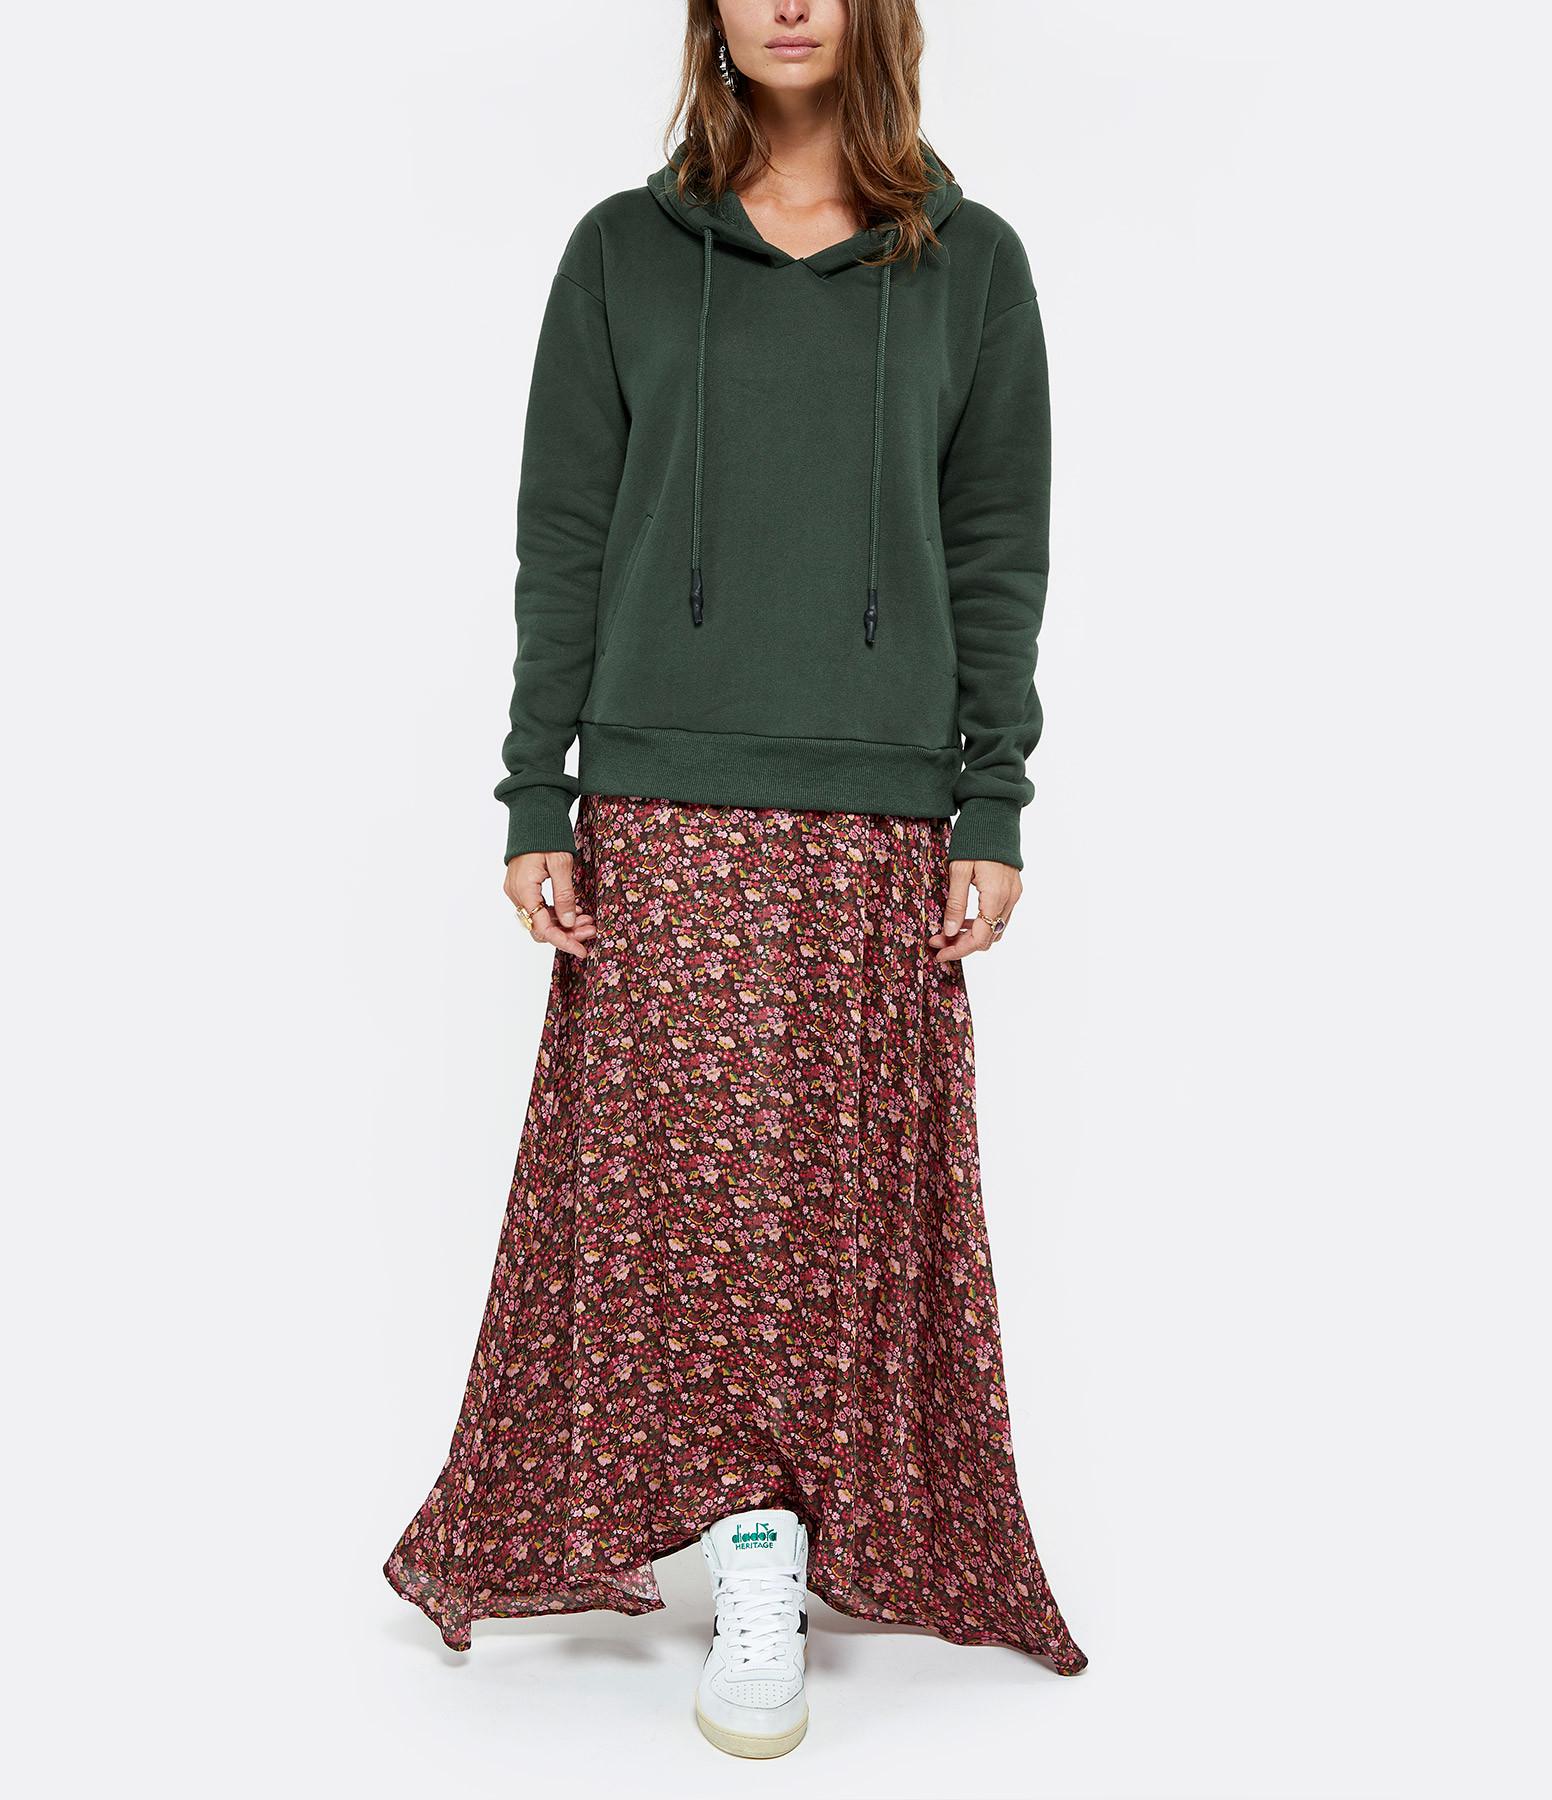 MAISON HAUSSMANN - Robe Pull Jade